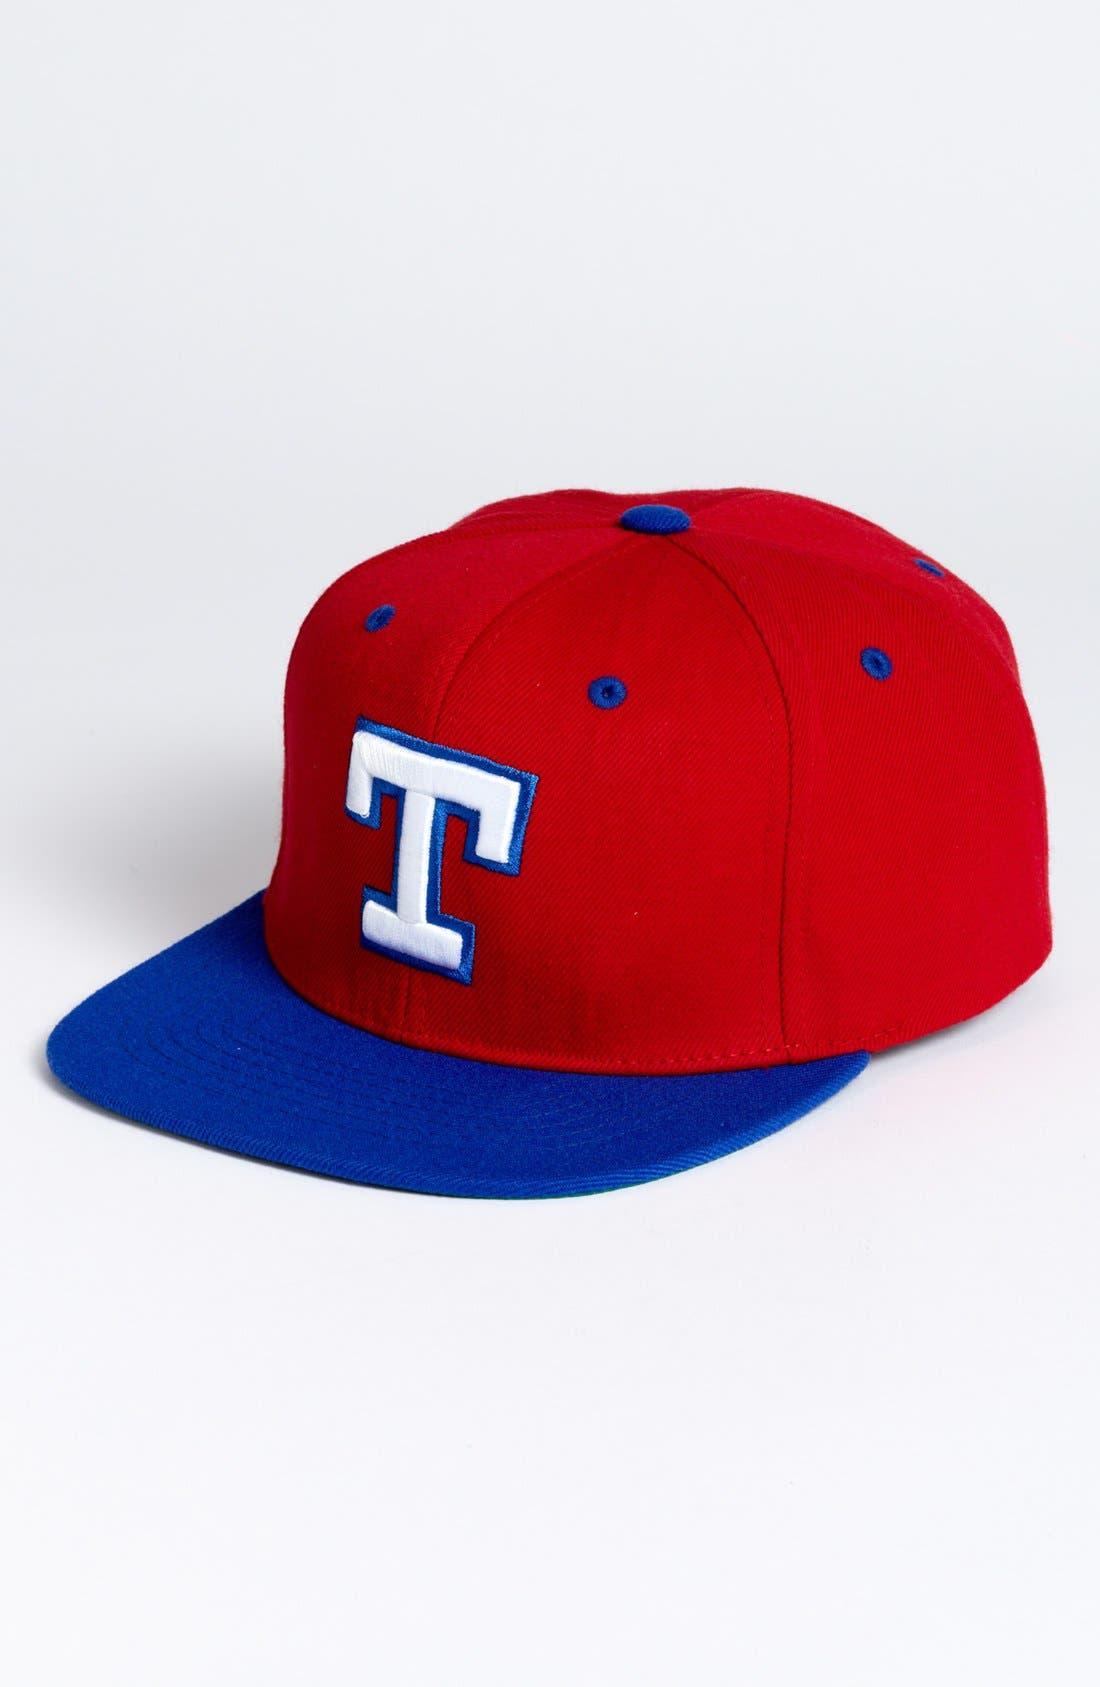 Alternate Image 1 Selected - American Needle 'Texas Rangers - Back 2 Front' Snapback Baseball Cap